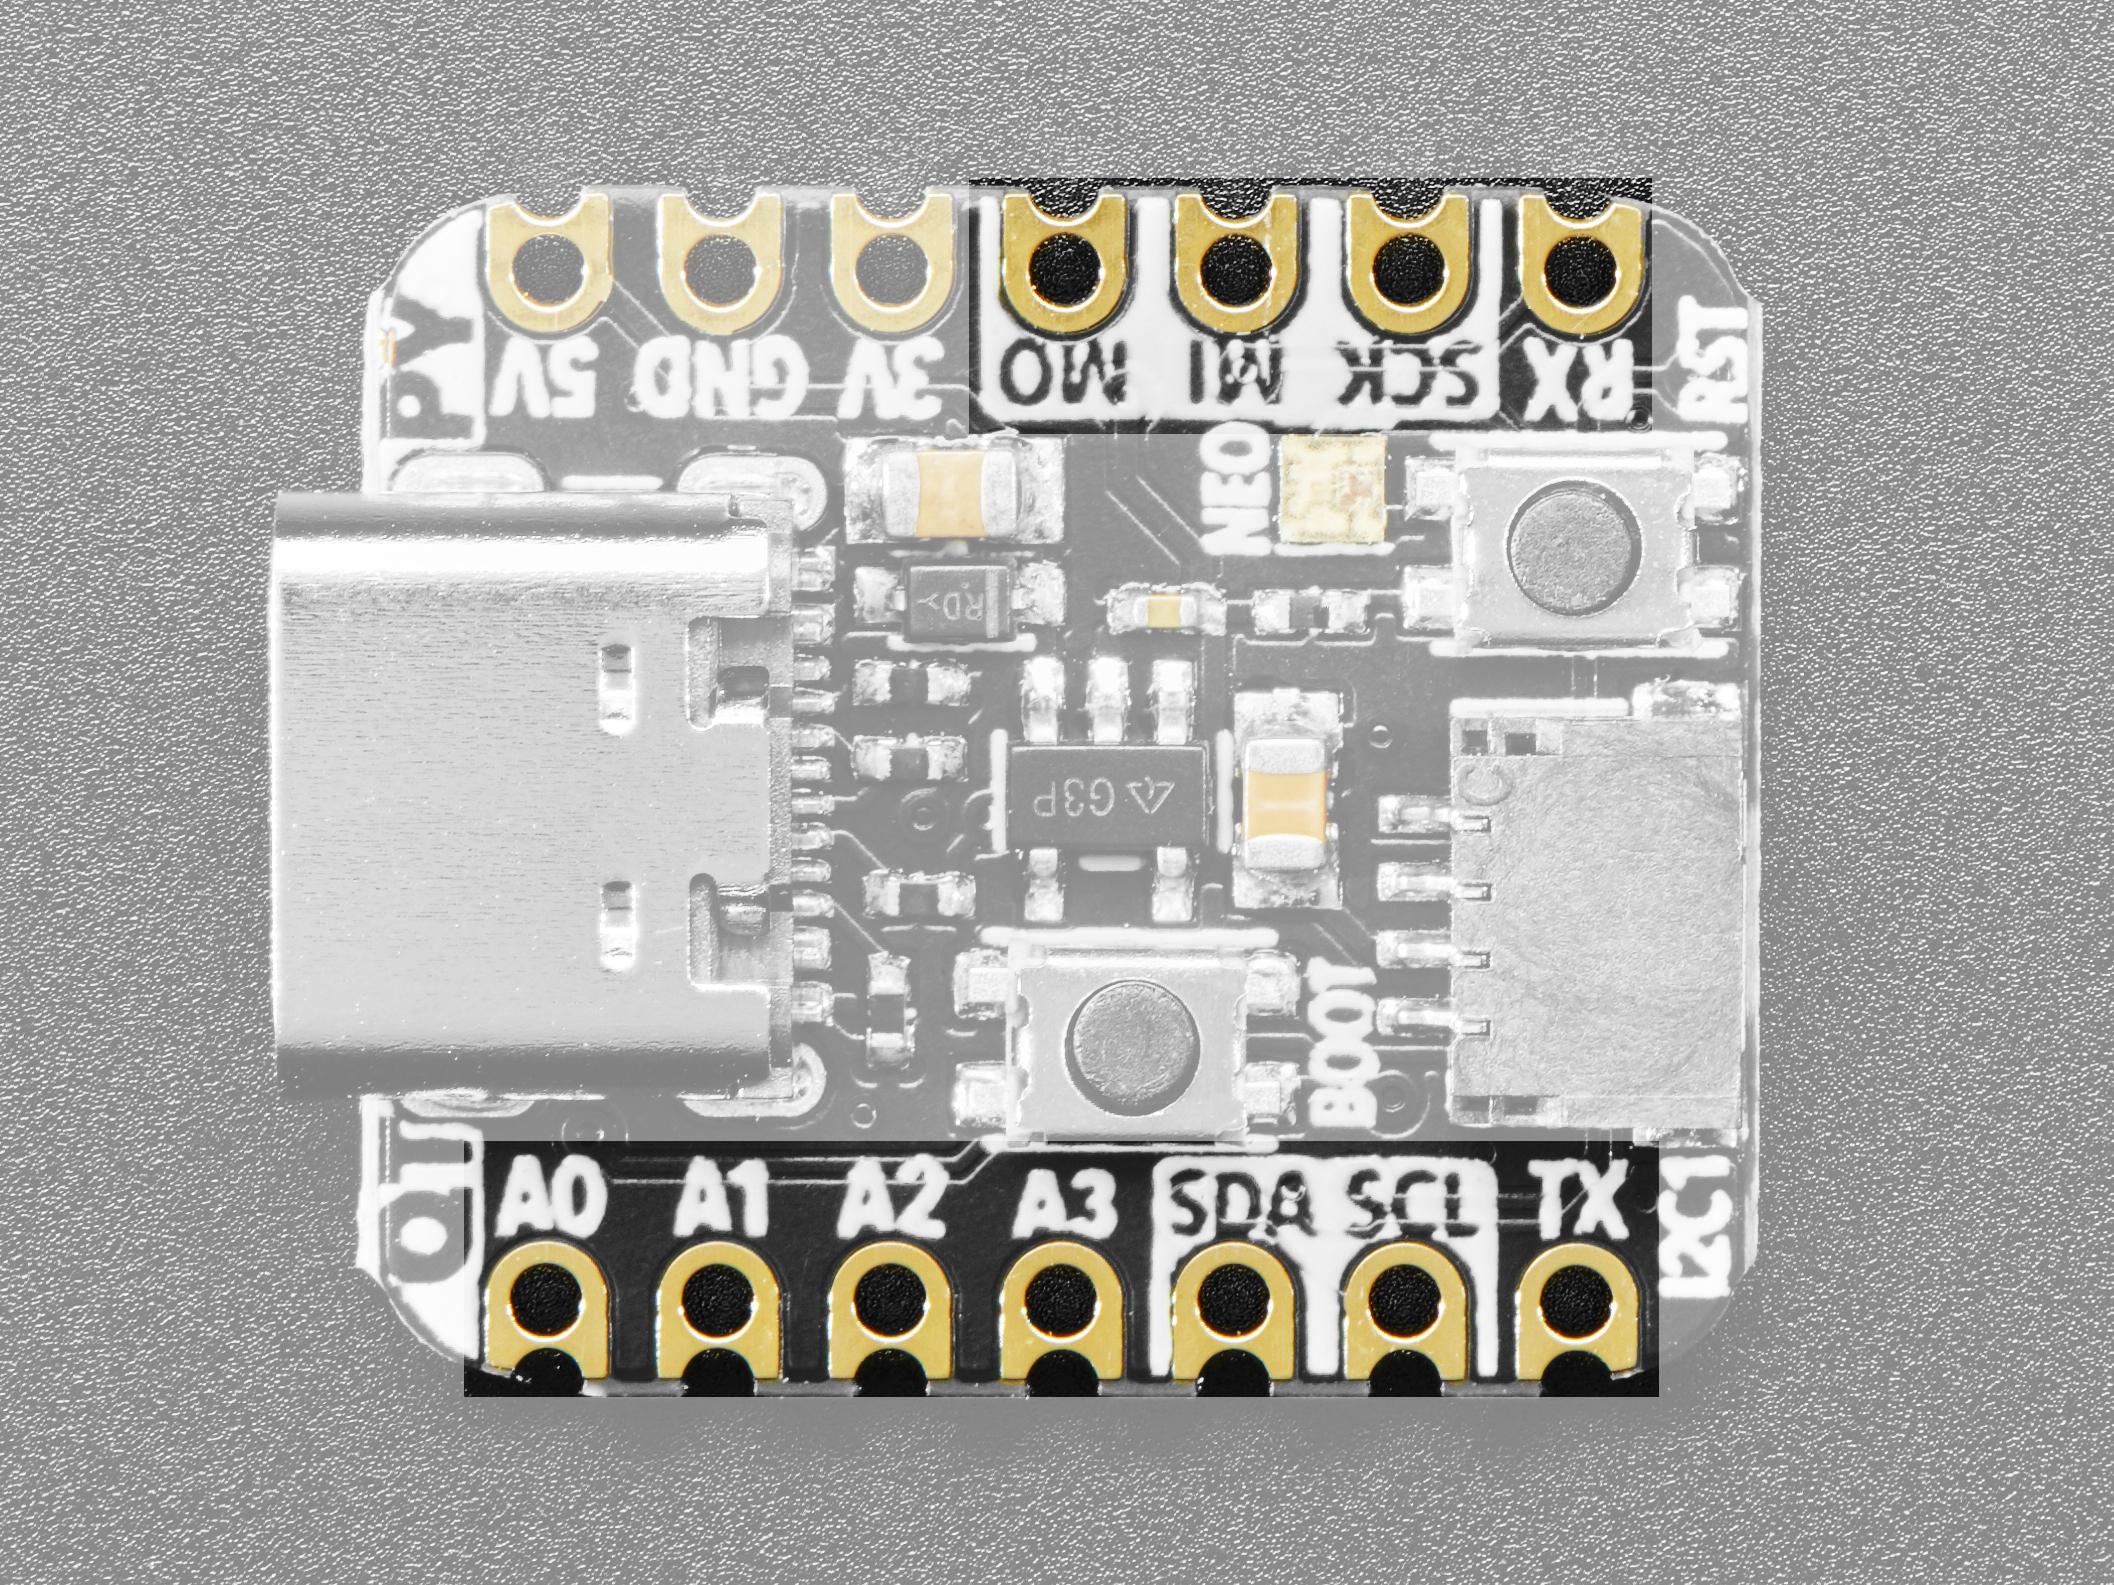 adafruit_products_QTRP_pinouts_pins.jpg